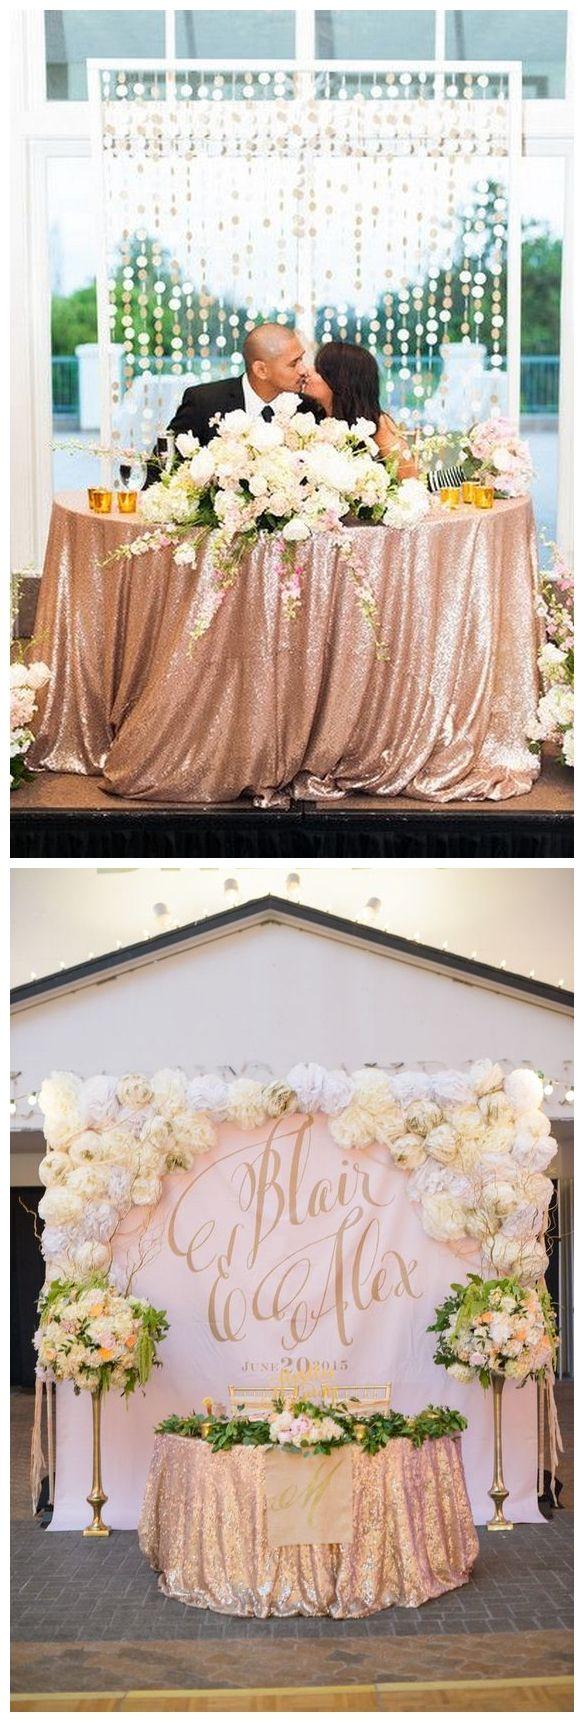 40 Rose Gold Metallic Wedding Color Ideas / http://www.himisspuff.com/rose-gold-metallic-wedding-color-ideas/